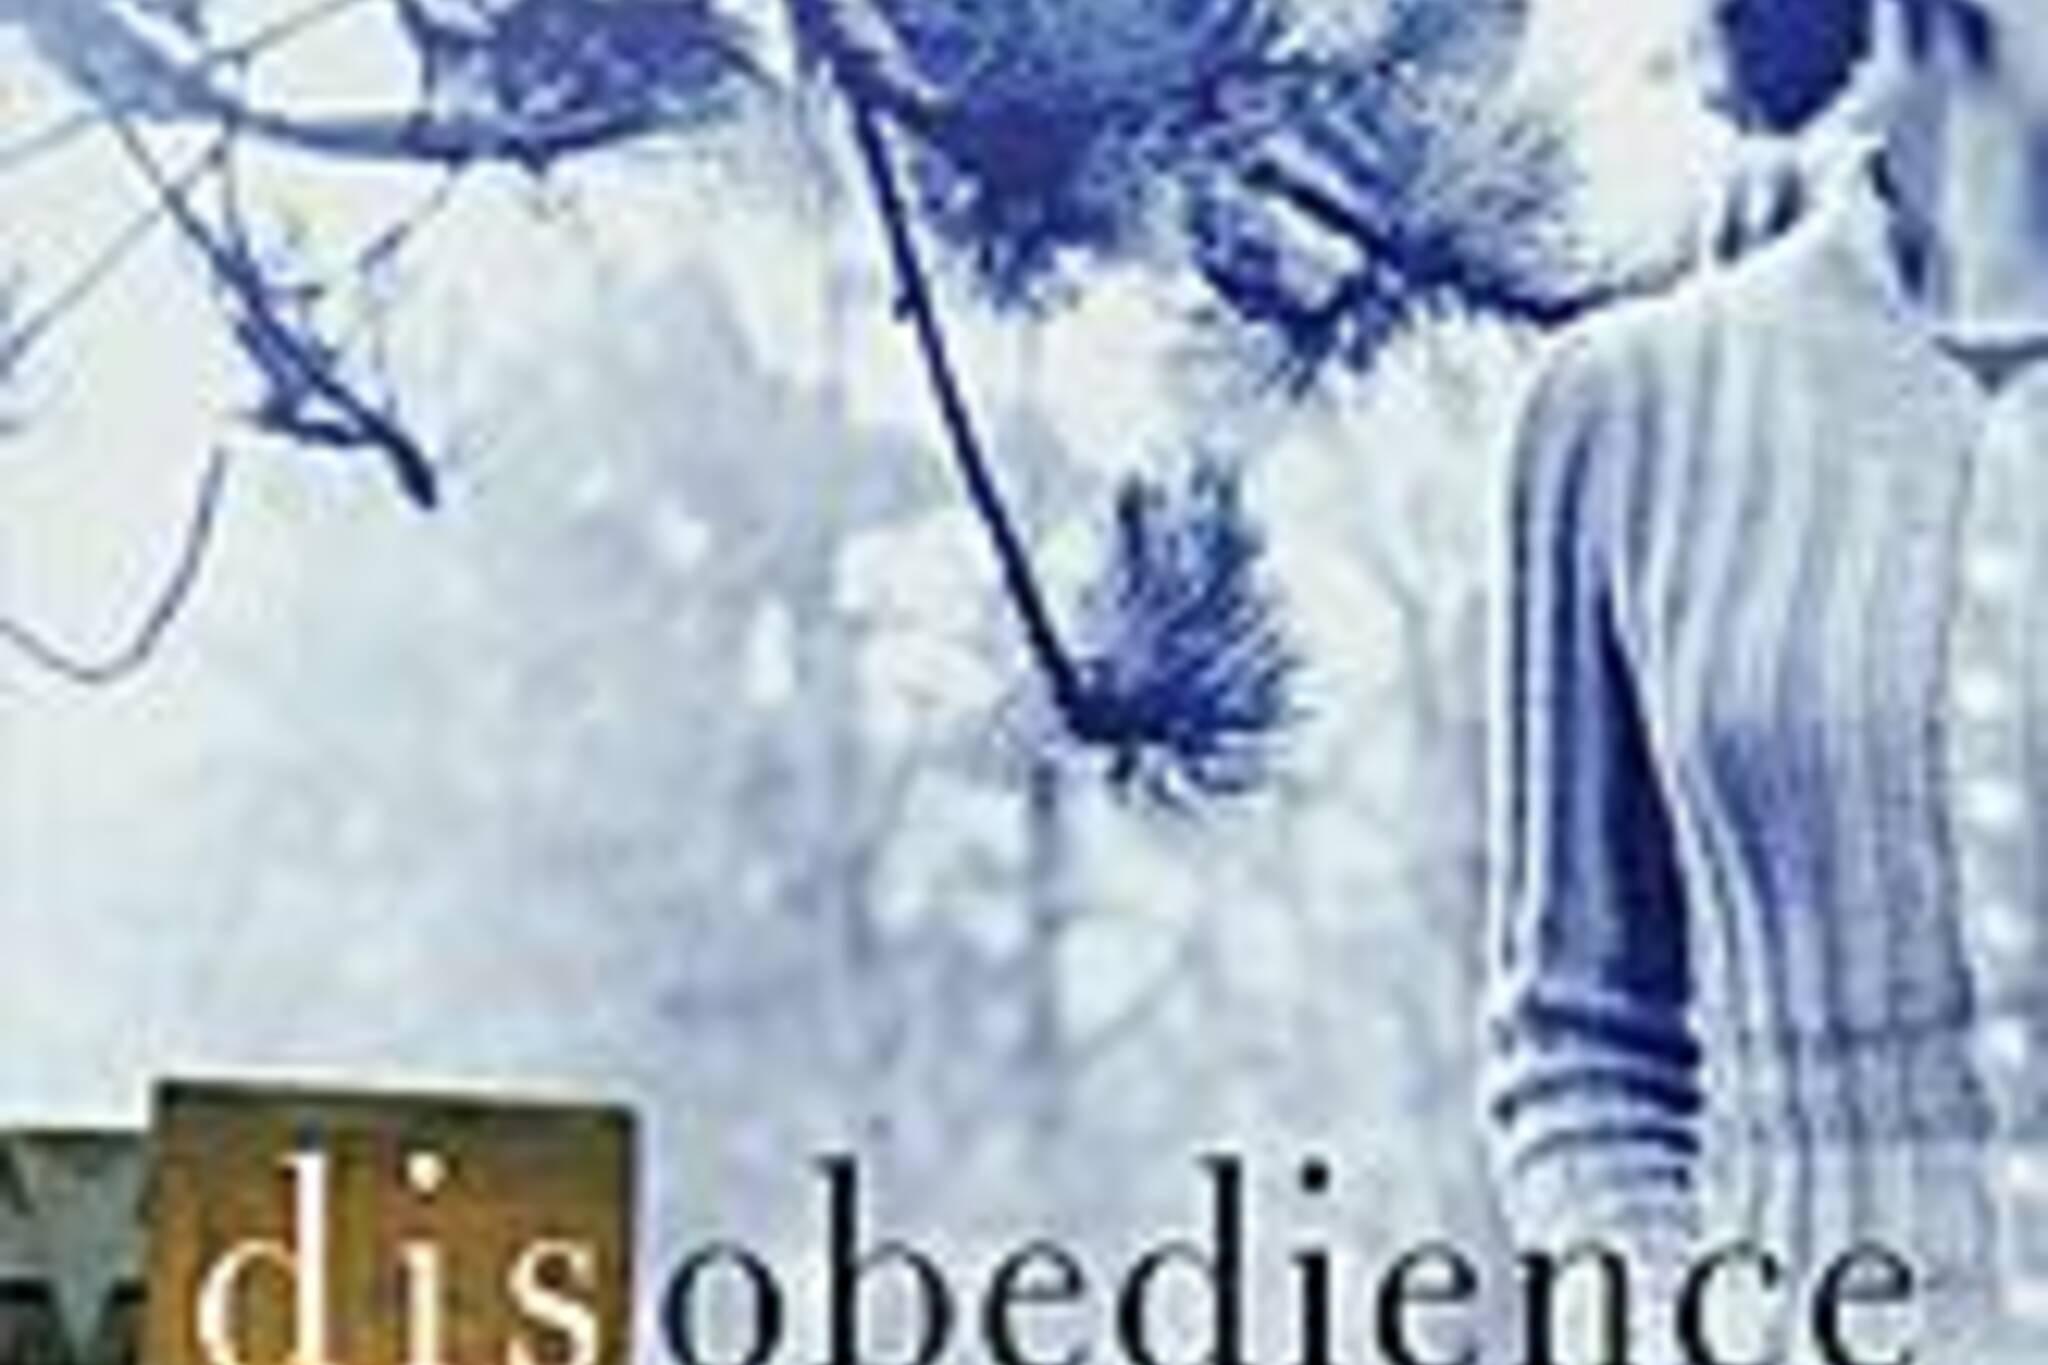 20061218_disobedience.jpg